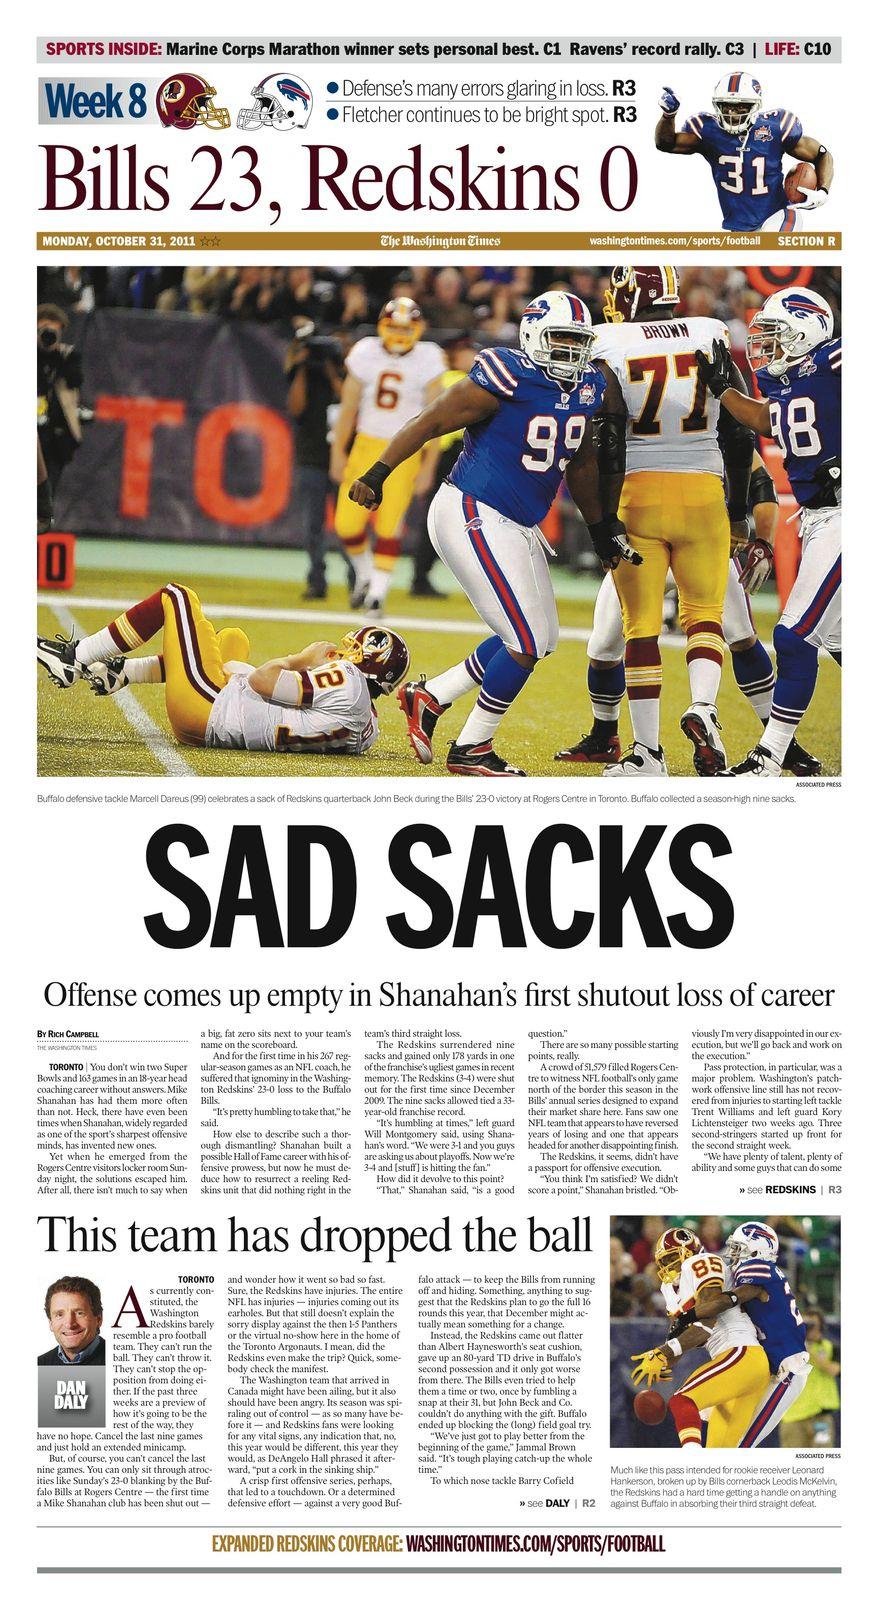 Week 8 Section: Bills 23, Redskins 0.